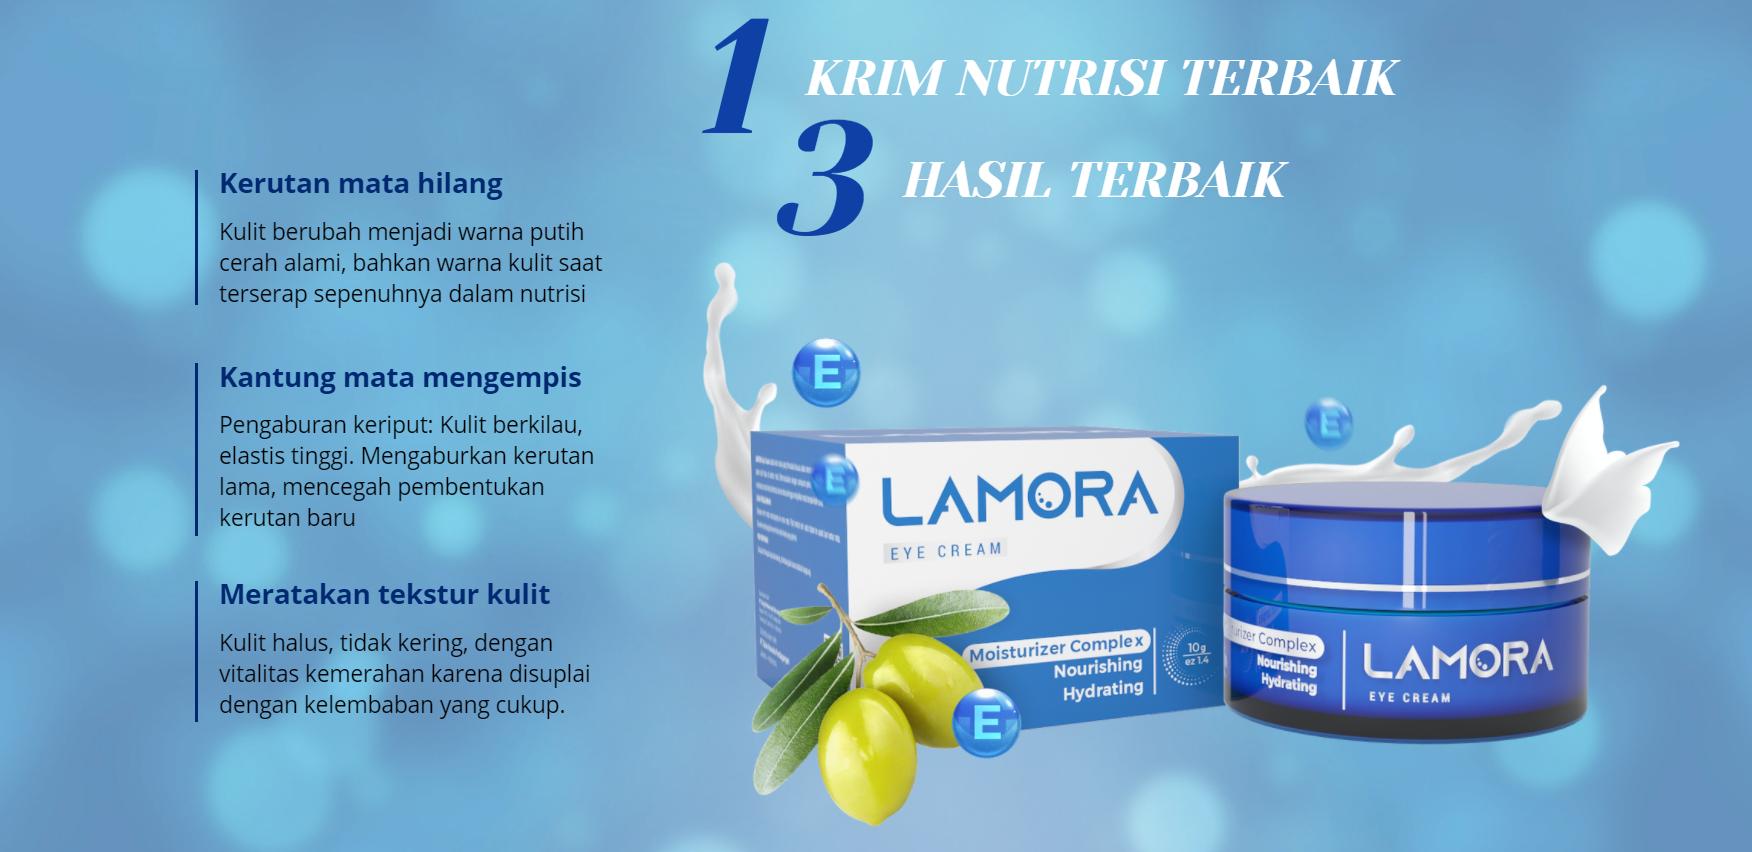 Lamora Eye Cream